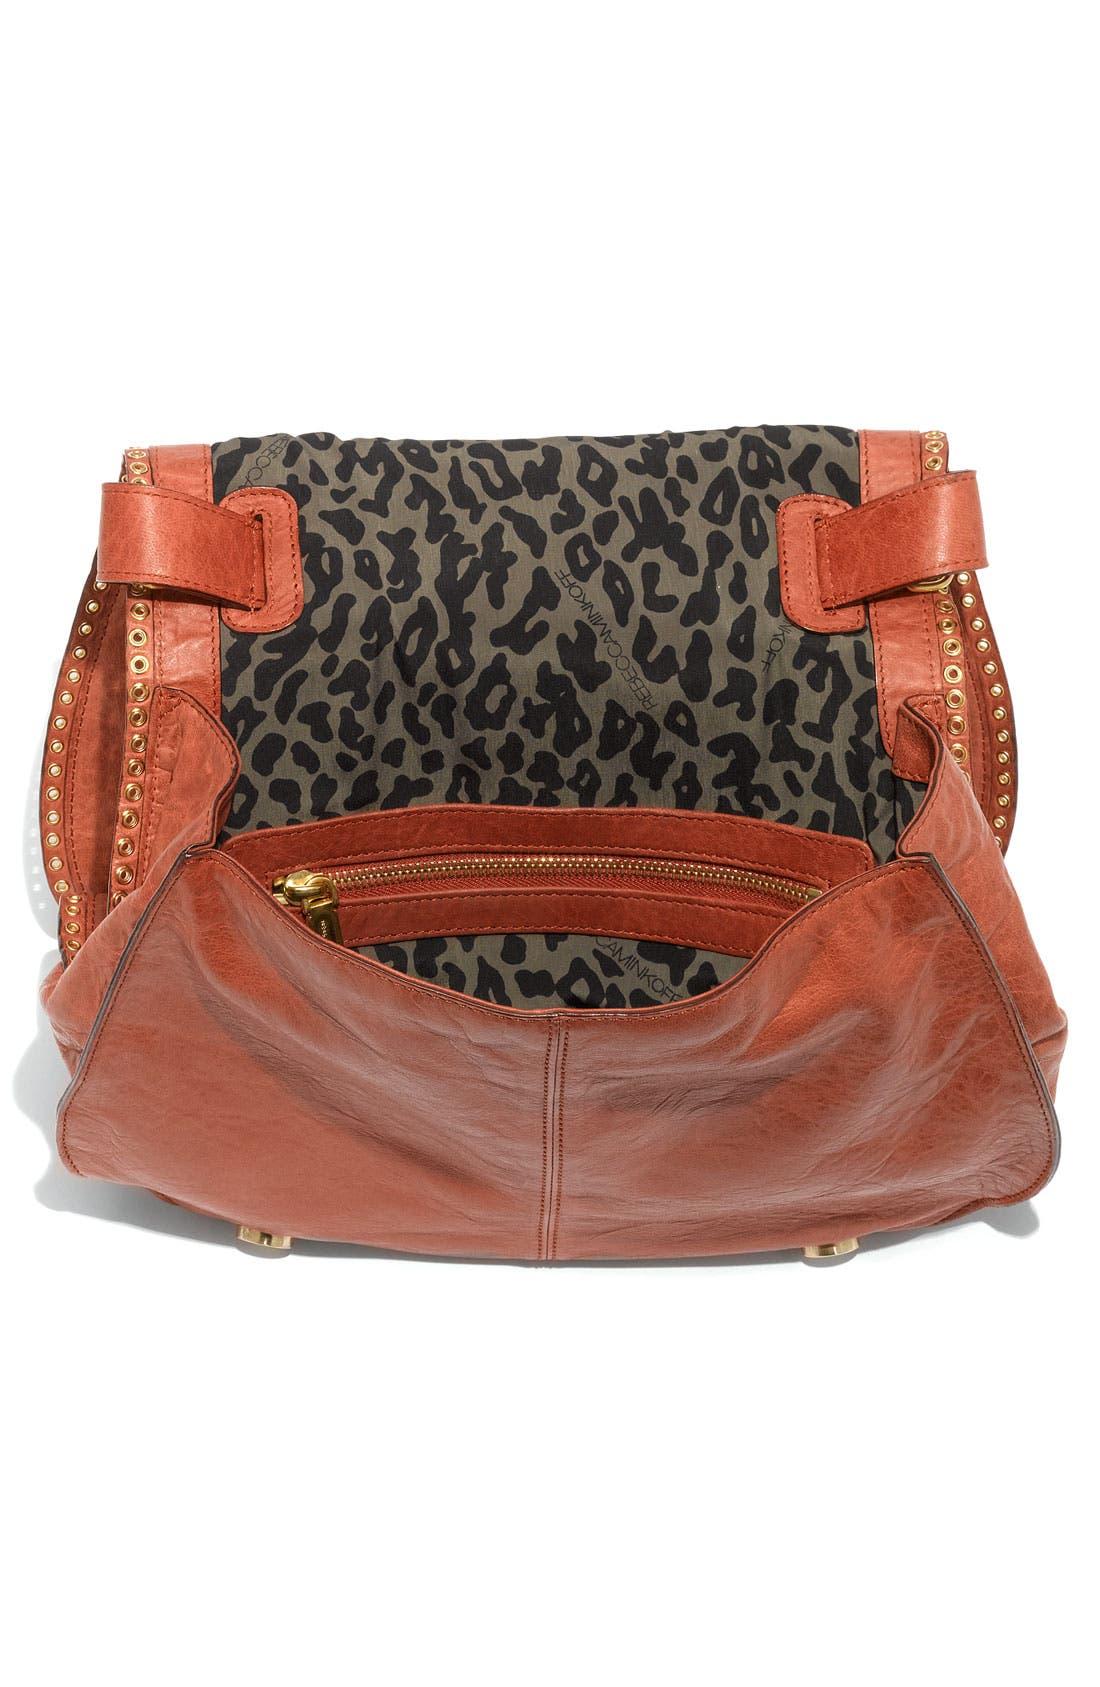 Alternate Image 3  - Rebecca Minkoff 'Vanity' Glazed Leather Crossbody Bag